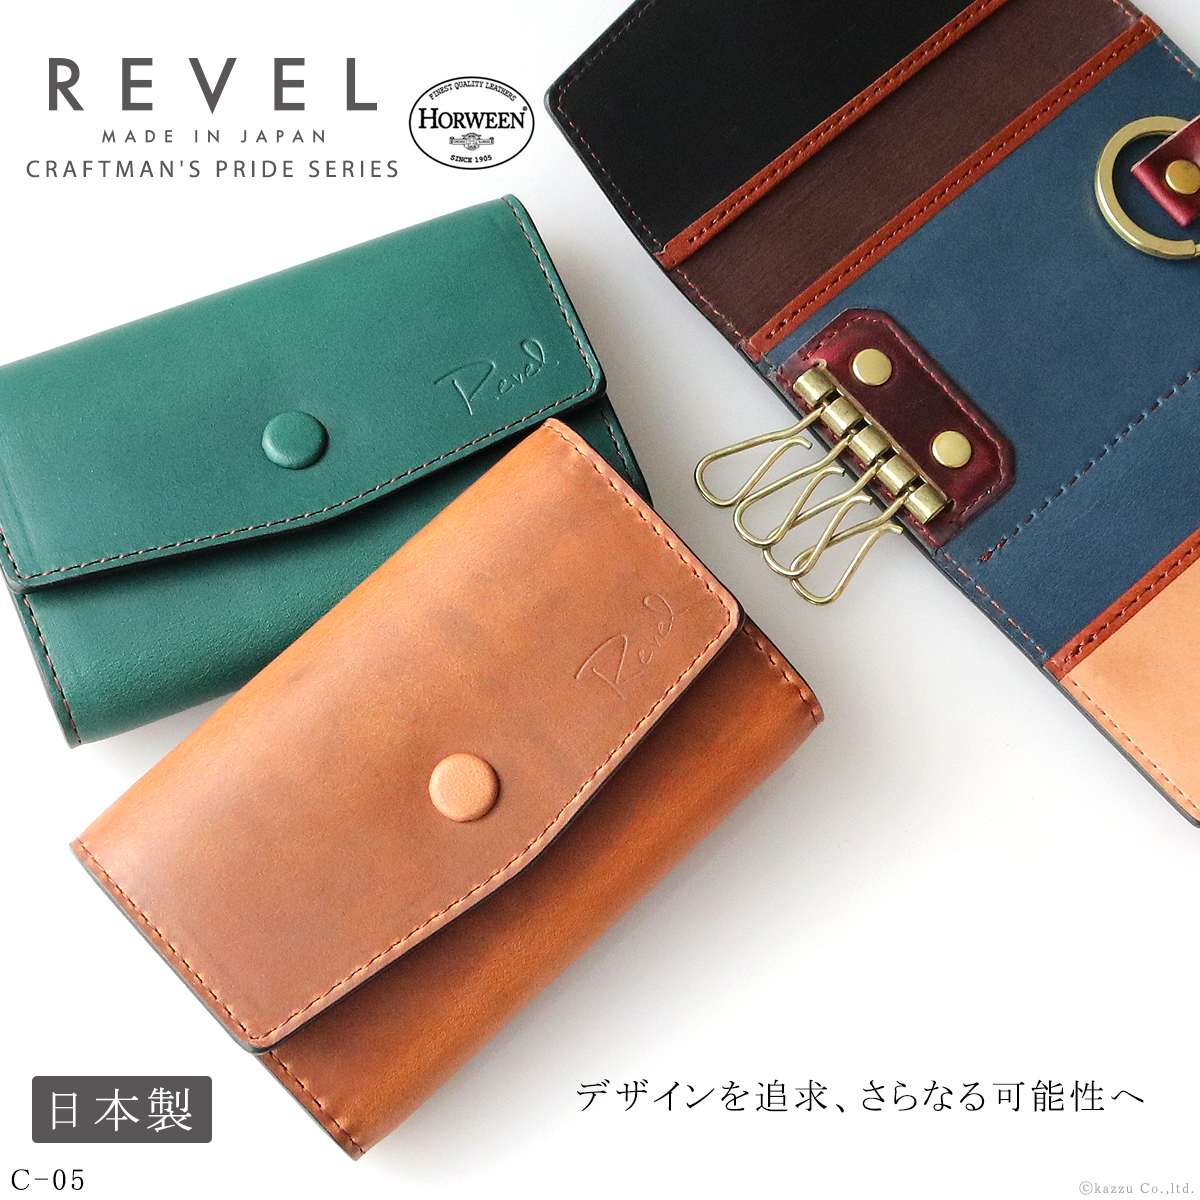 REVEL クロムエクセルレザー 日本製 4連キーケース